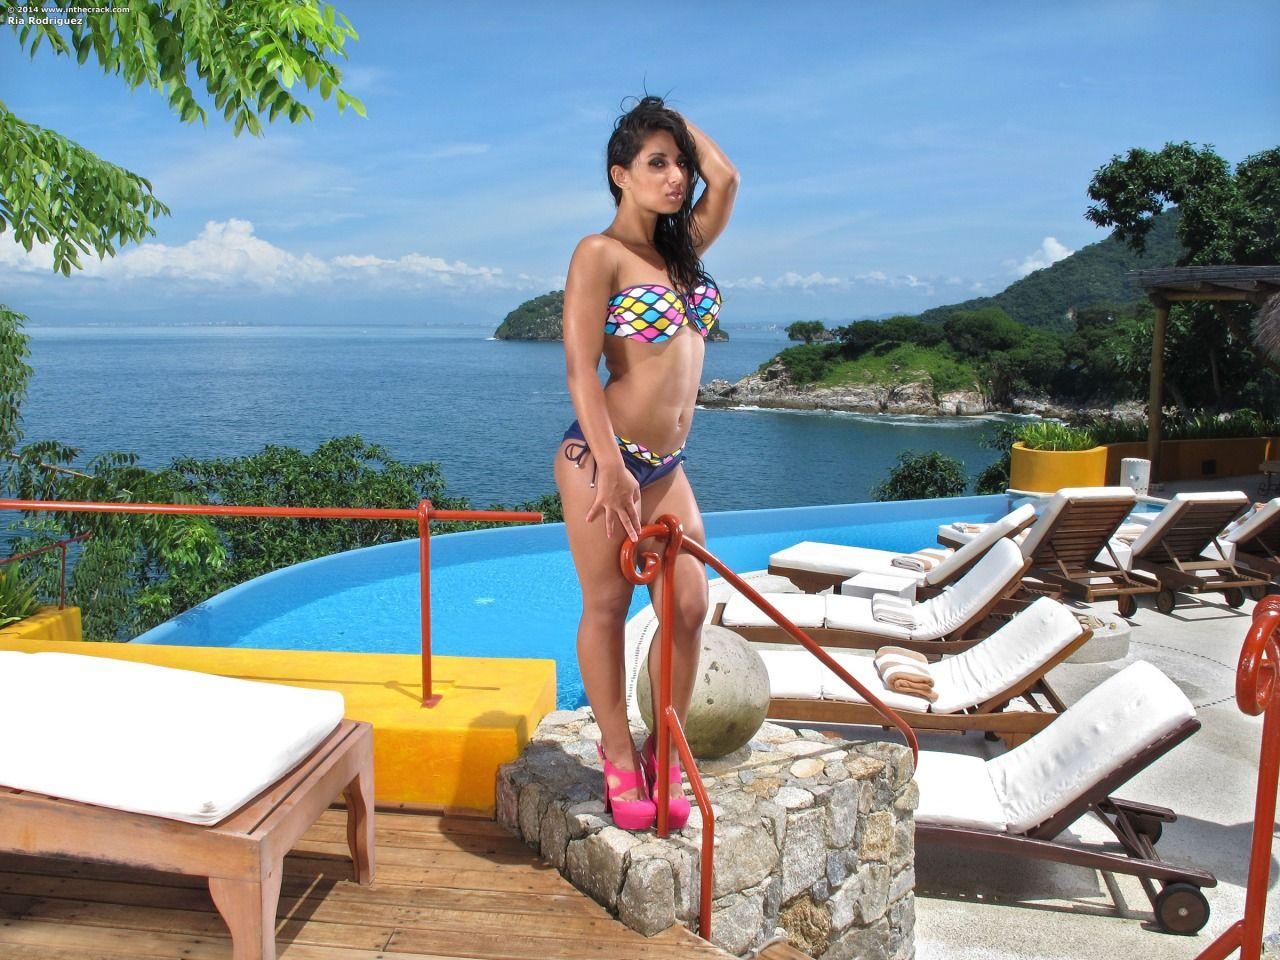 Ria Rodriguez Latina Erotic Bikinis Nude Posts Sexy Things I